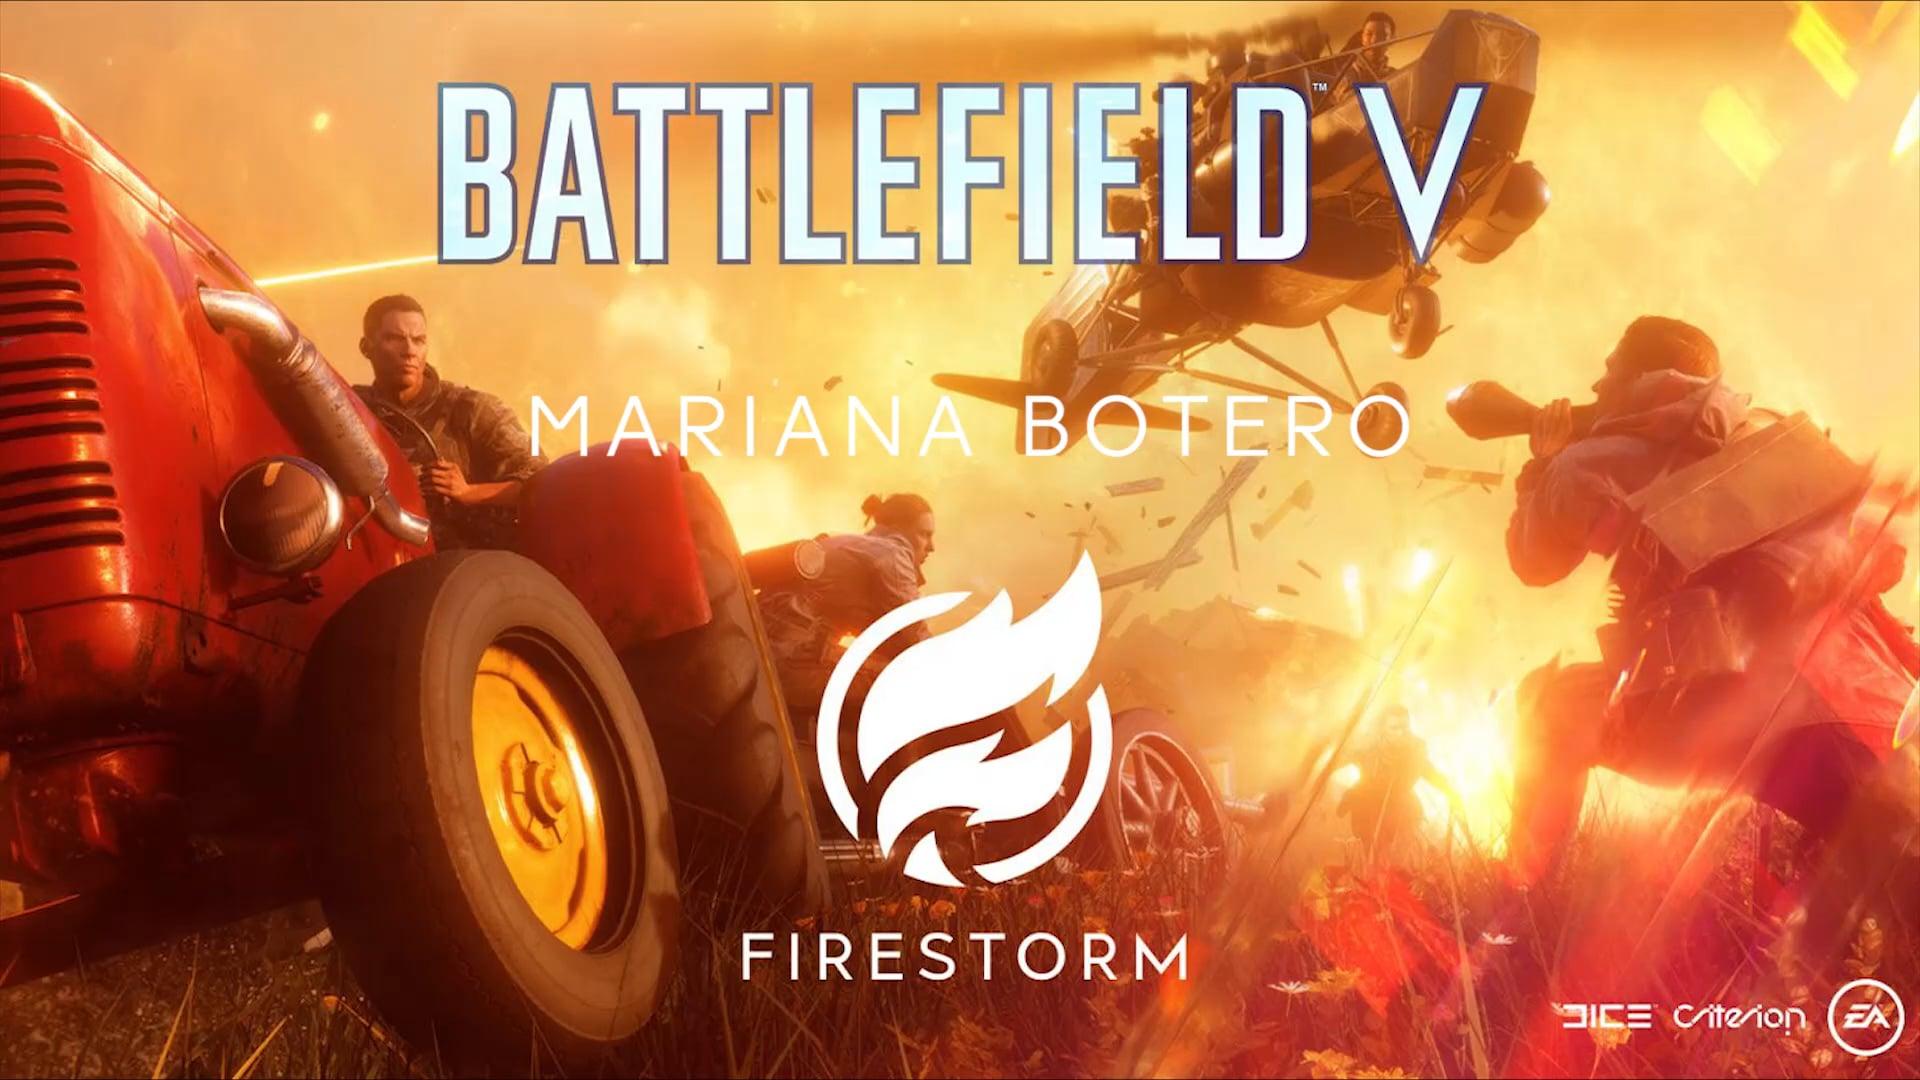 Battlefield 5 - Firestorm Sound Design Reel Mariana Botero